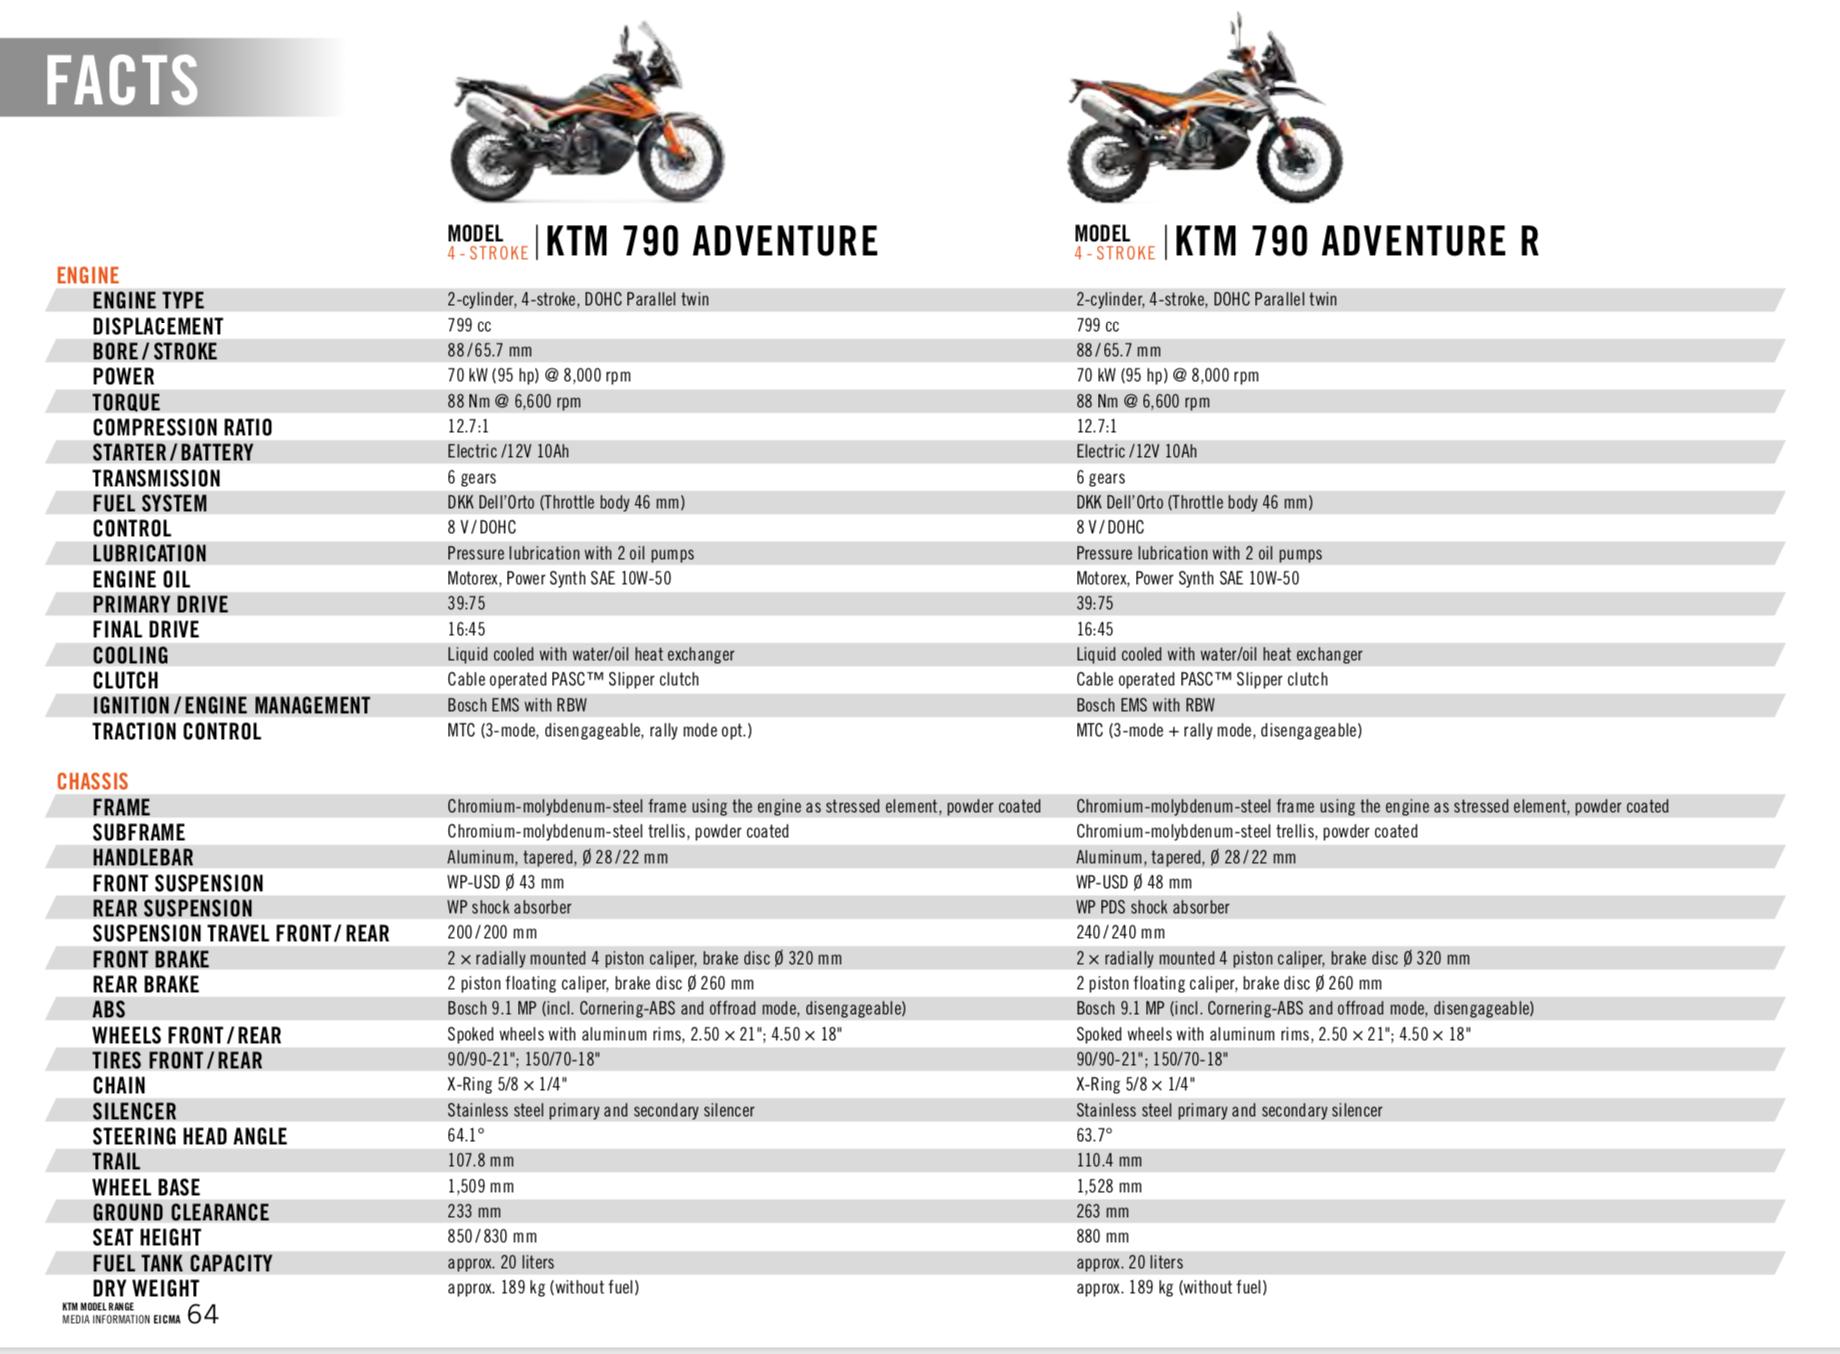 KTM 790 Adventure and R specs